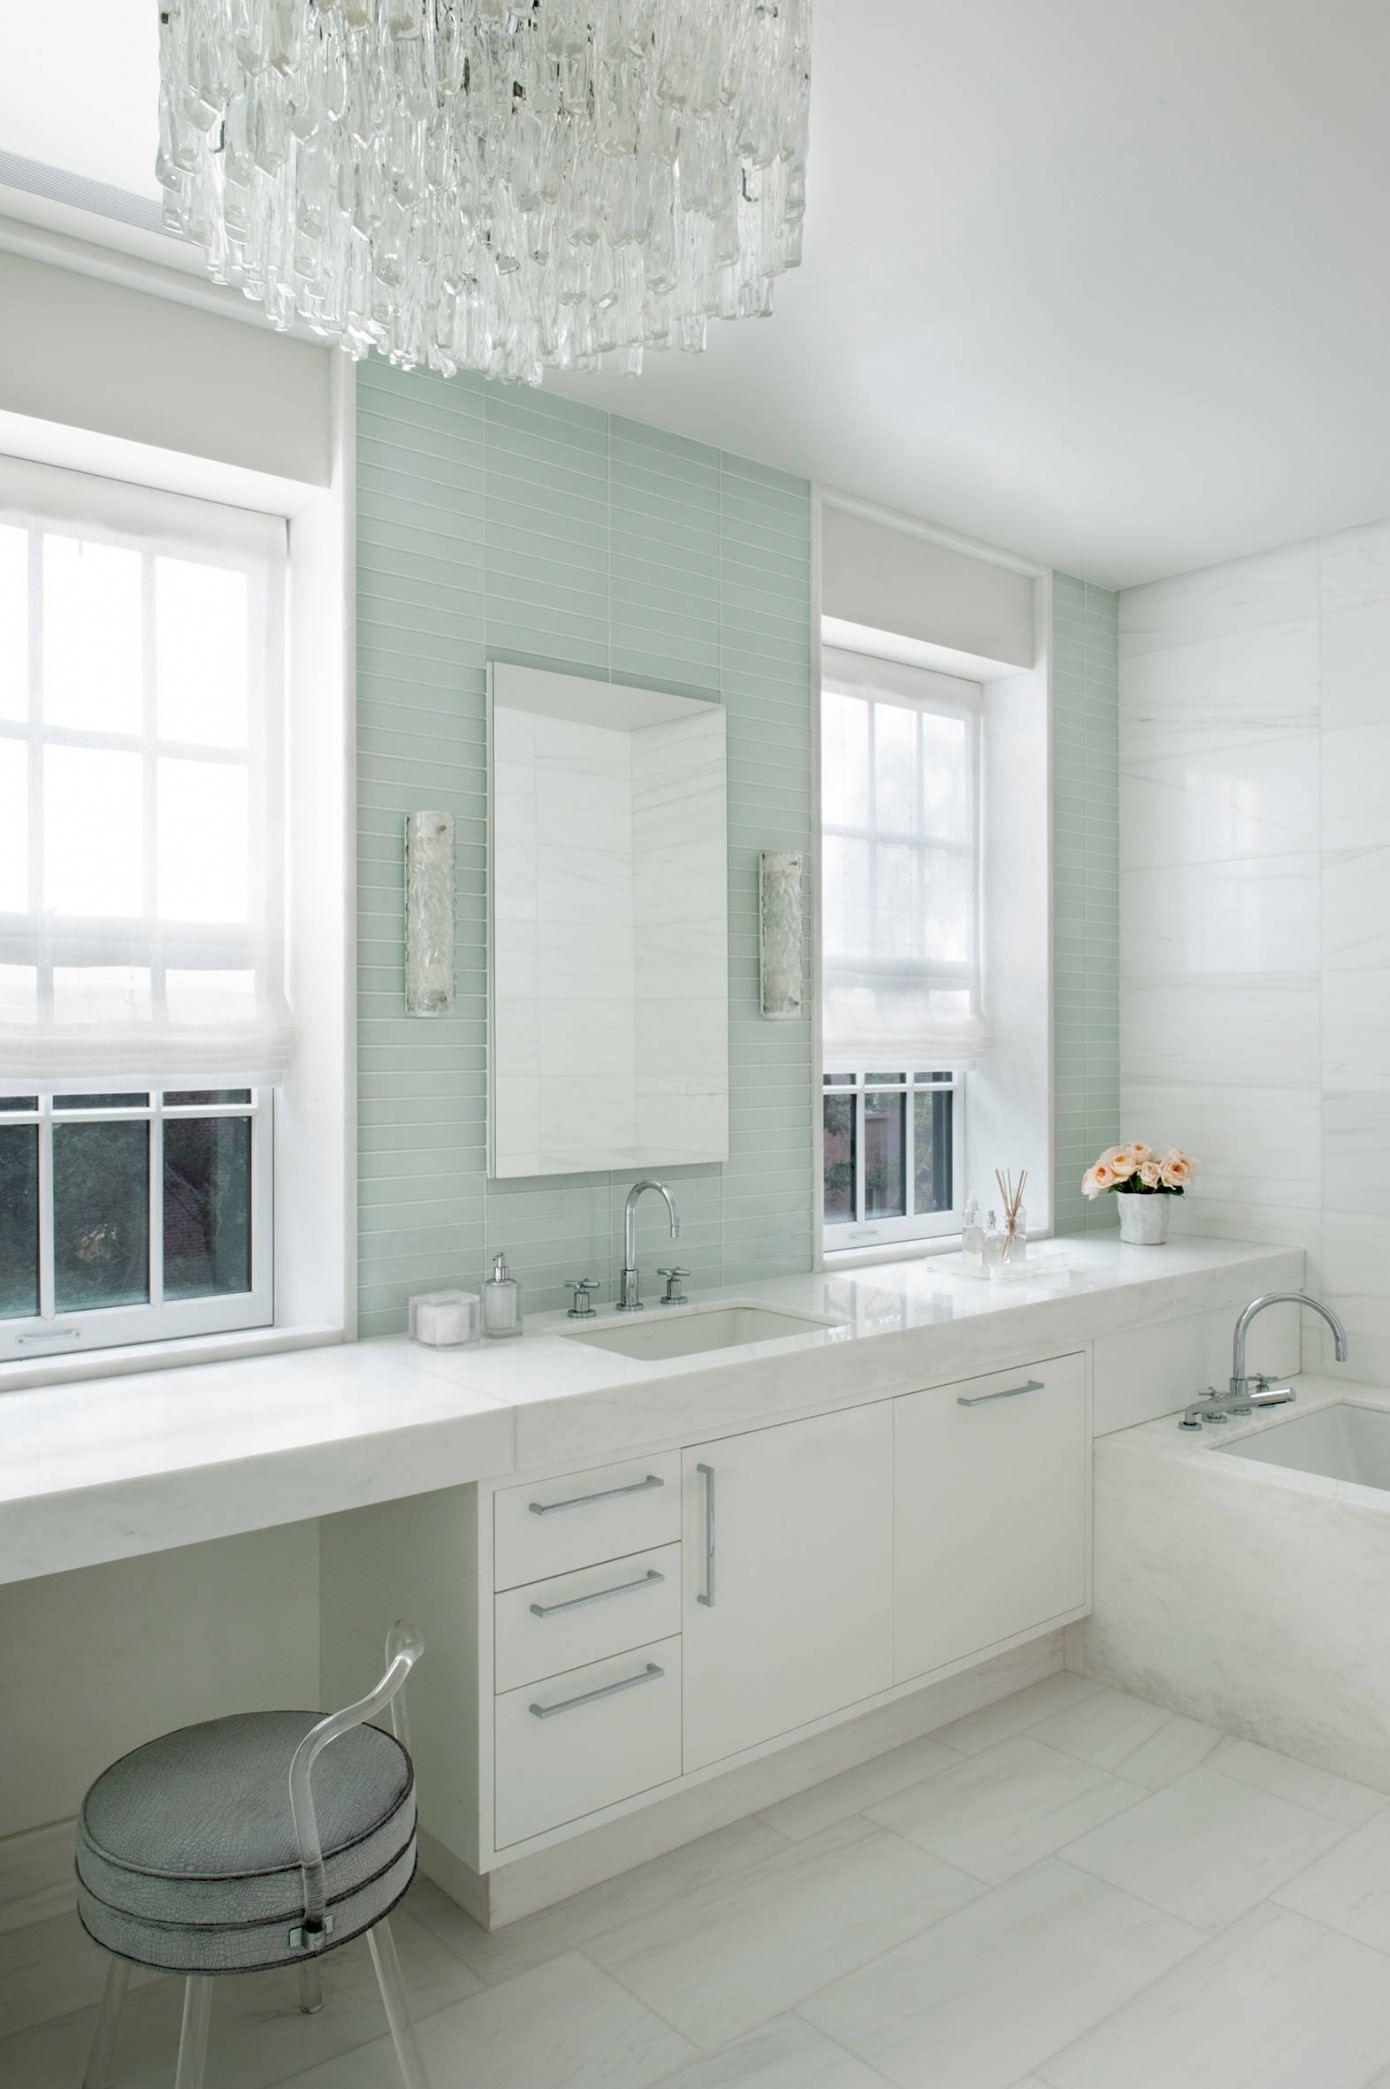 021-chelsea-townhouse-david-howell-design | HomeAdore | Deco ...